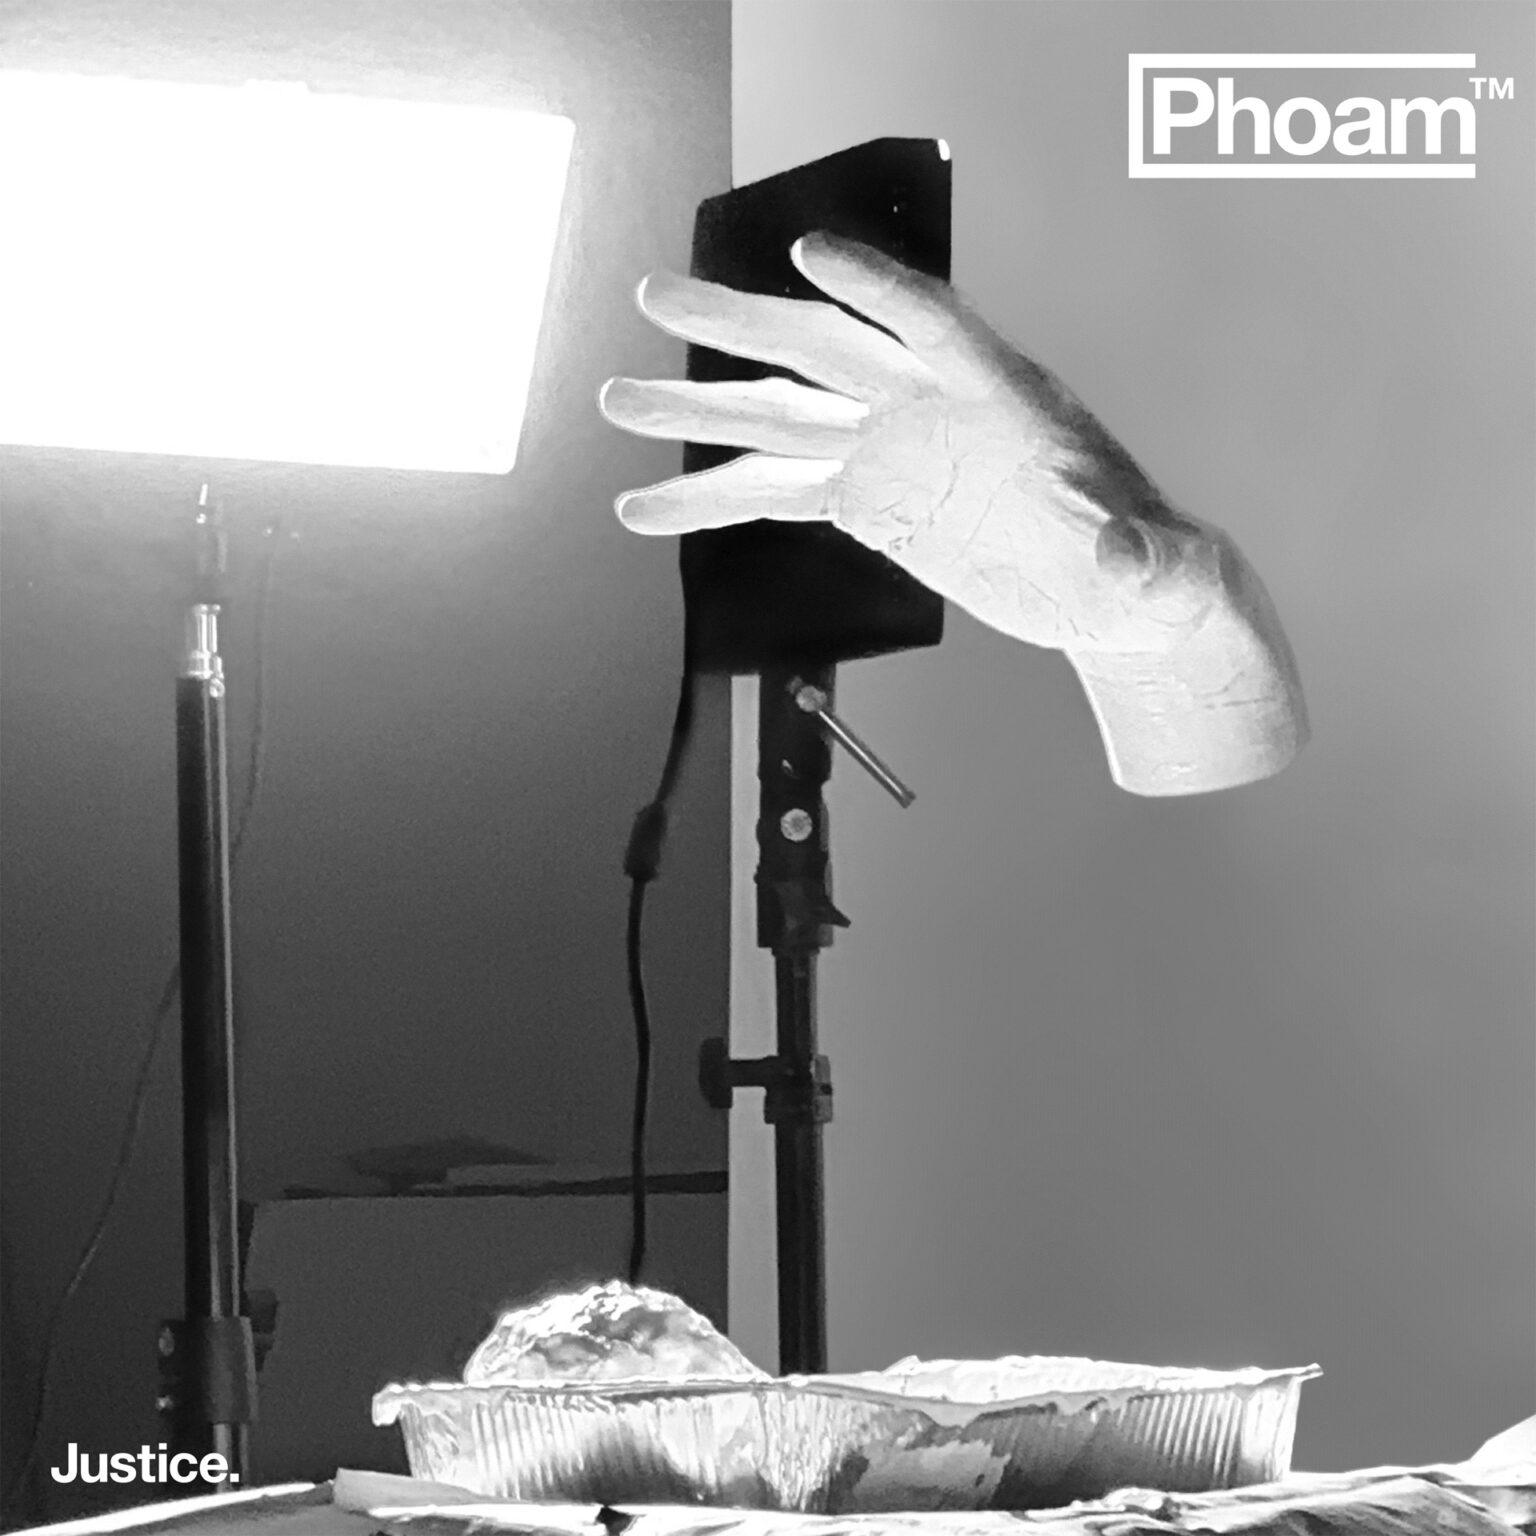 Phoam - Single - Justice - s'läuft! Radio-Promotion